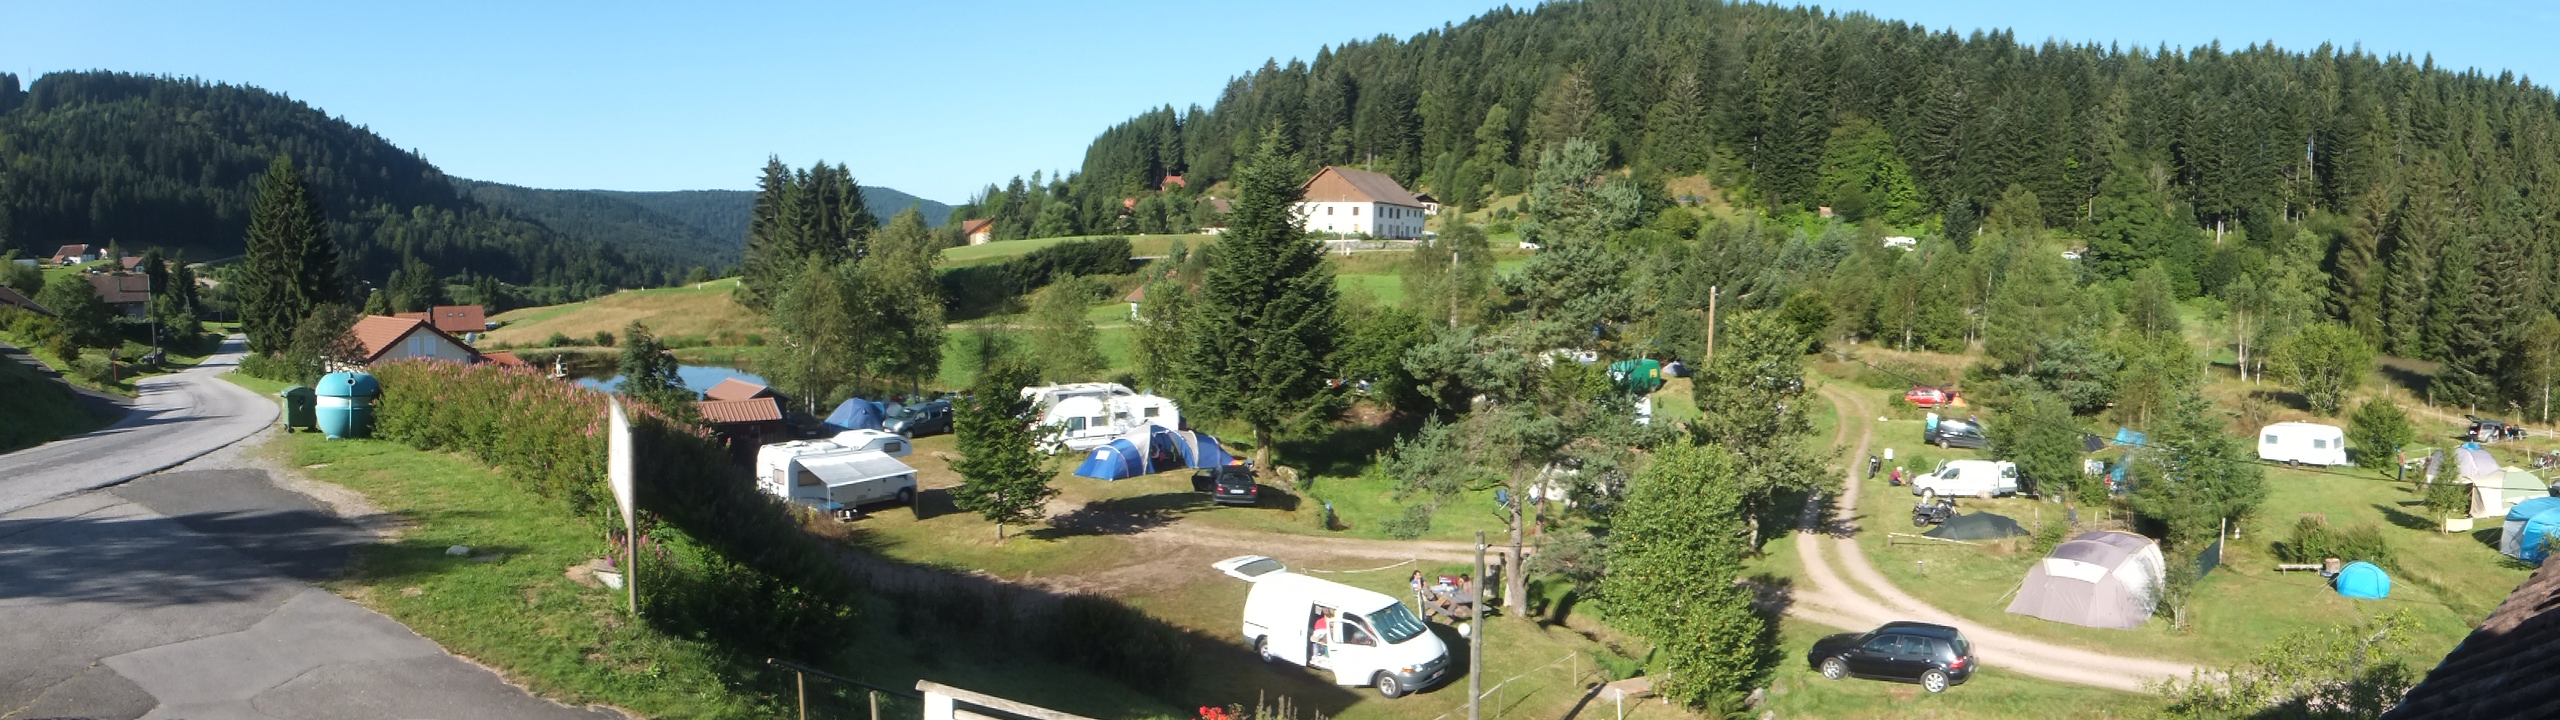 Camping Les Myrtilles, Camping Calme Et Familial À Gerardmer ... serapportantà Camping Gérardmer Avec Piscine